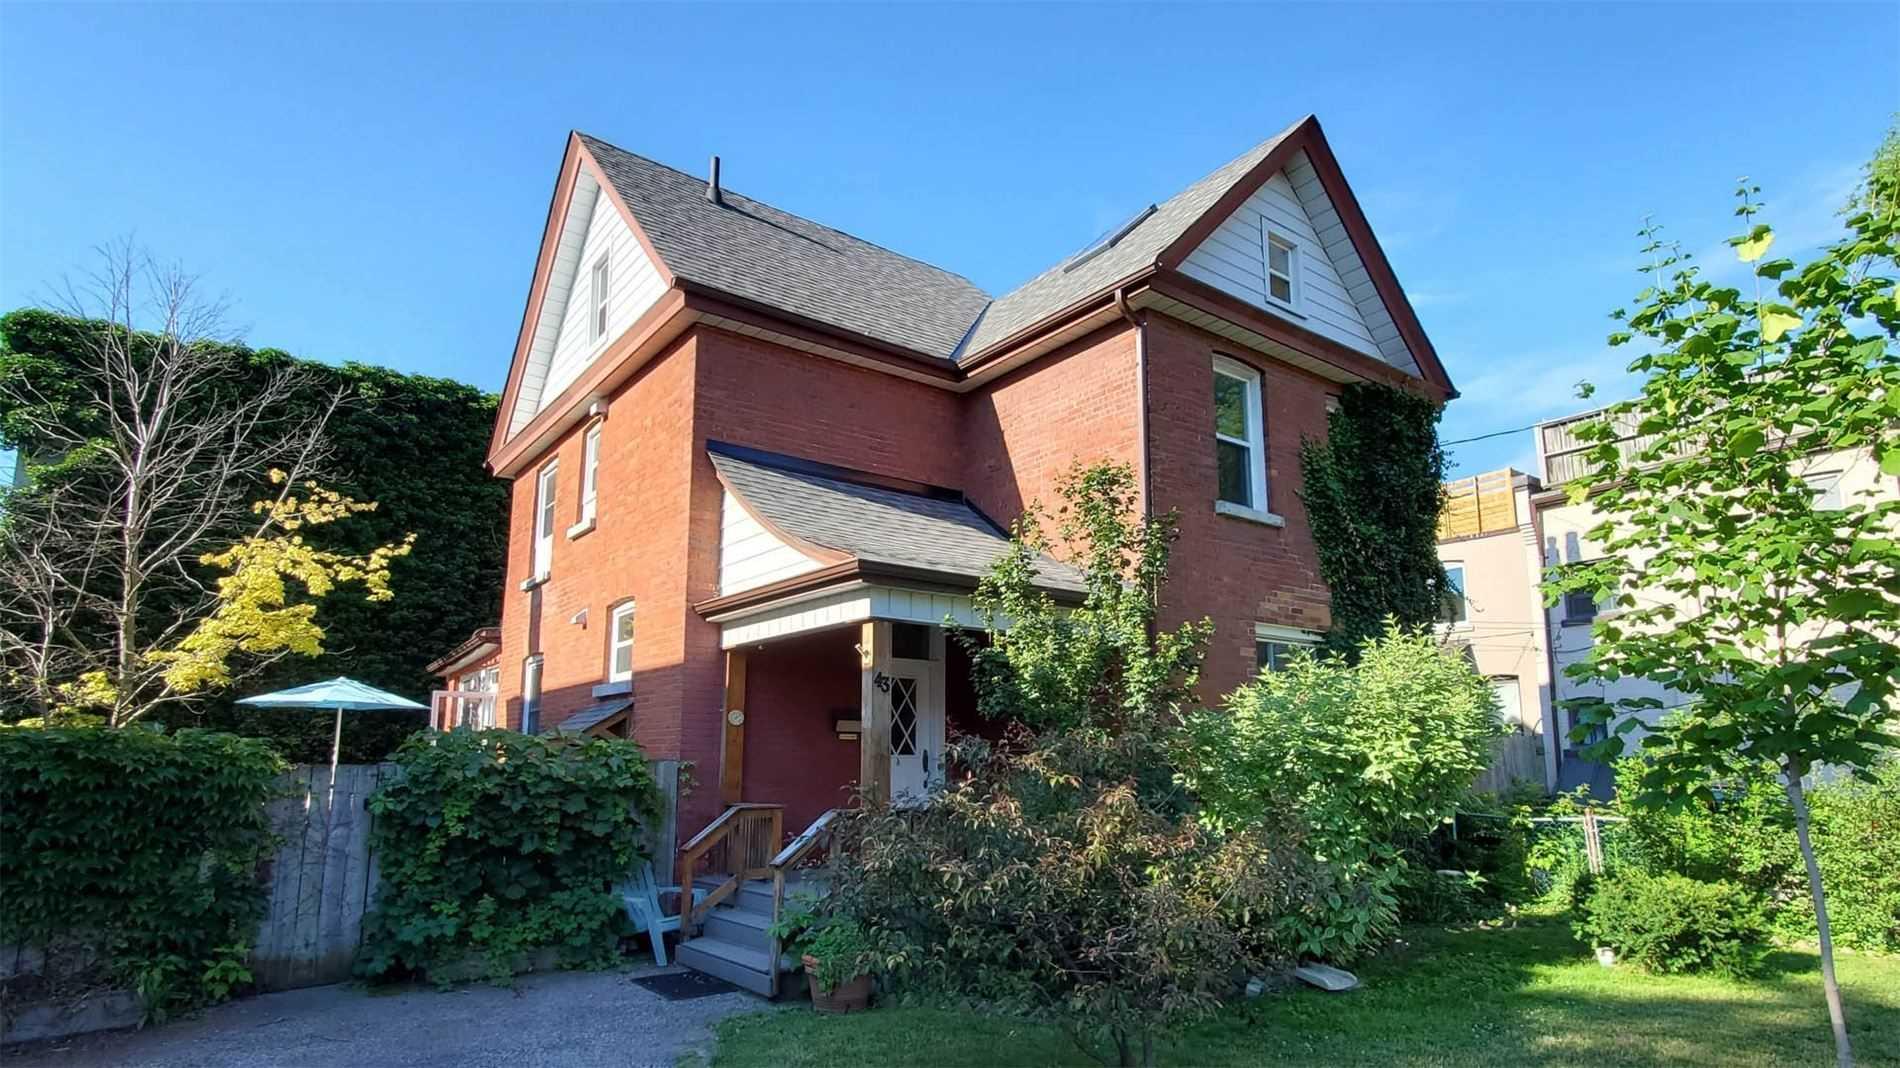 43 Northumberland St, Toronto, Ontario M6H1R2, 6 Bedrooms Bedrooms, 21 Rooms Rooms,4 BathroomsBathrooms,Triplex,For Sale,Northumberland,W5297869